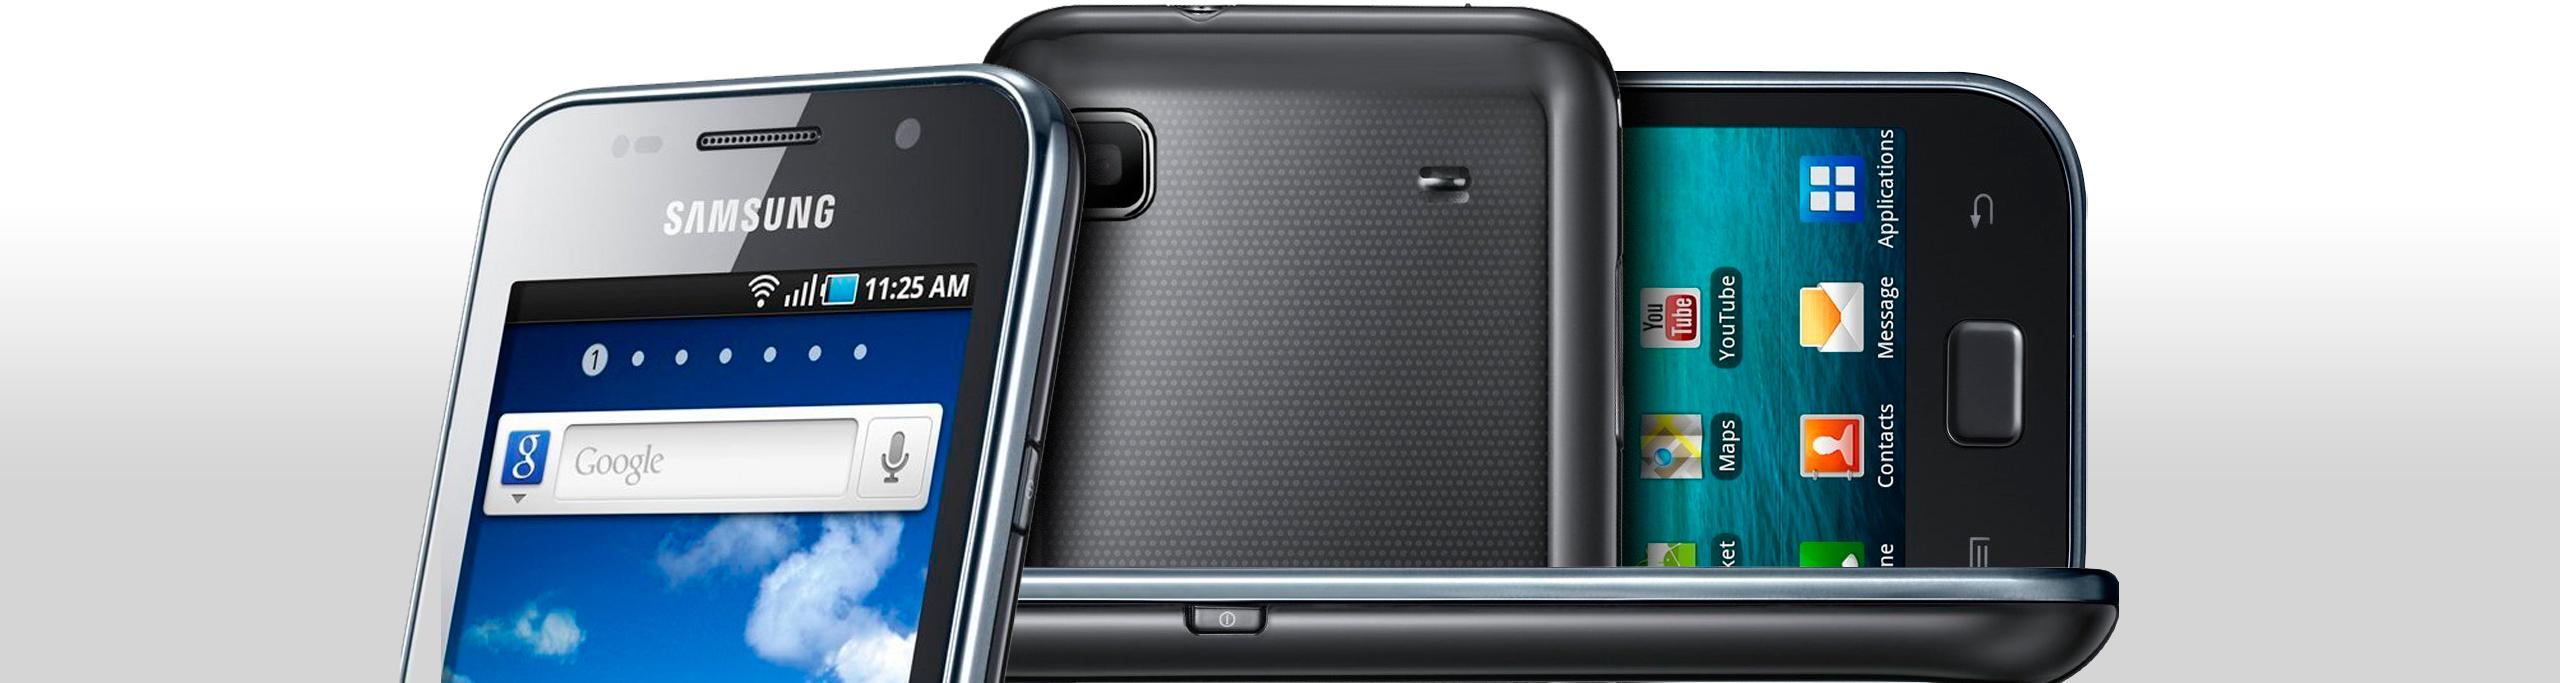 S SCL (i9003)